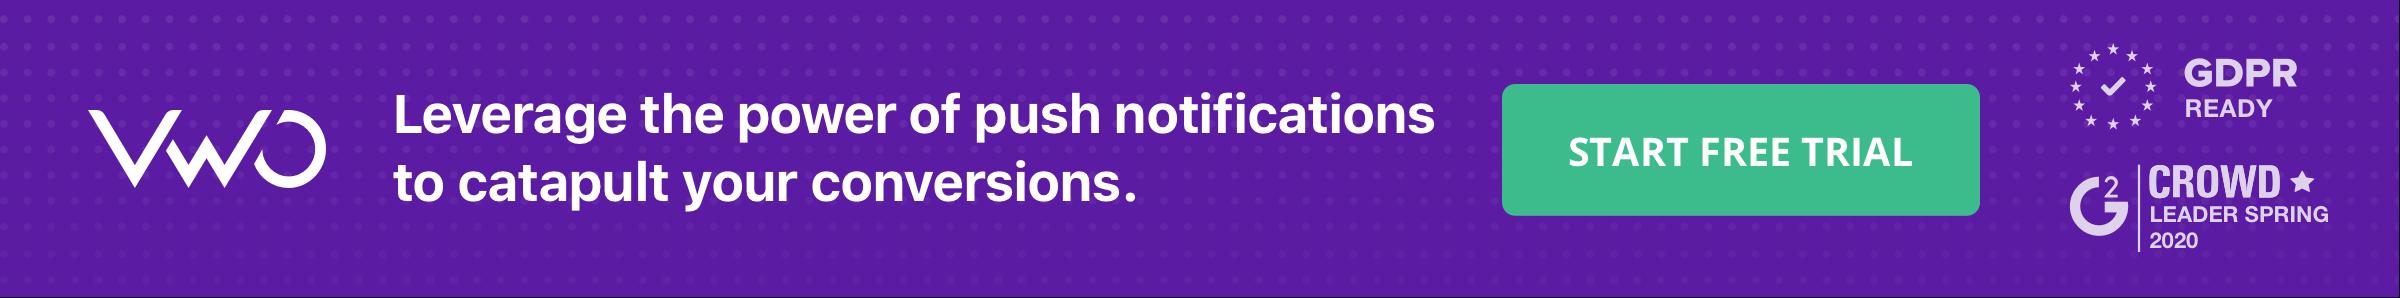 banner Push notifications